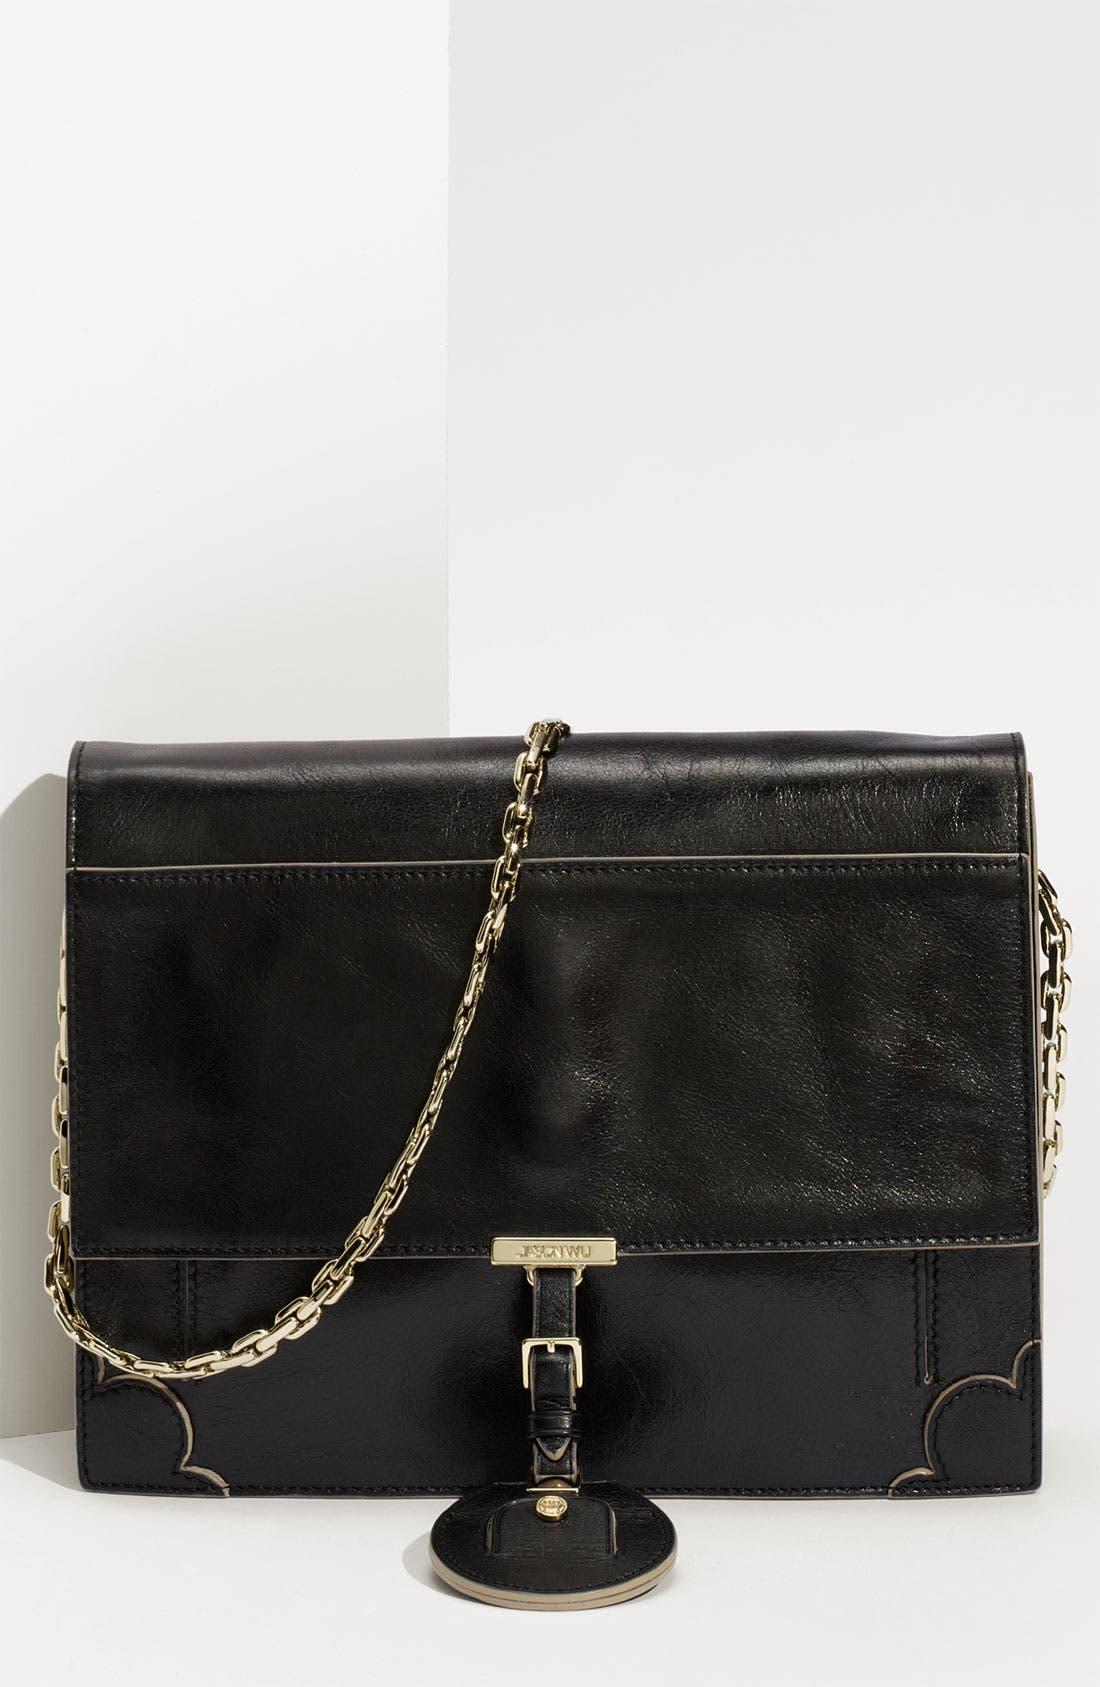 Jason Wu 'Jourdan' Calfskin Leather Shoulder Bag, Main, color, 001